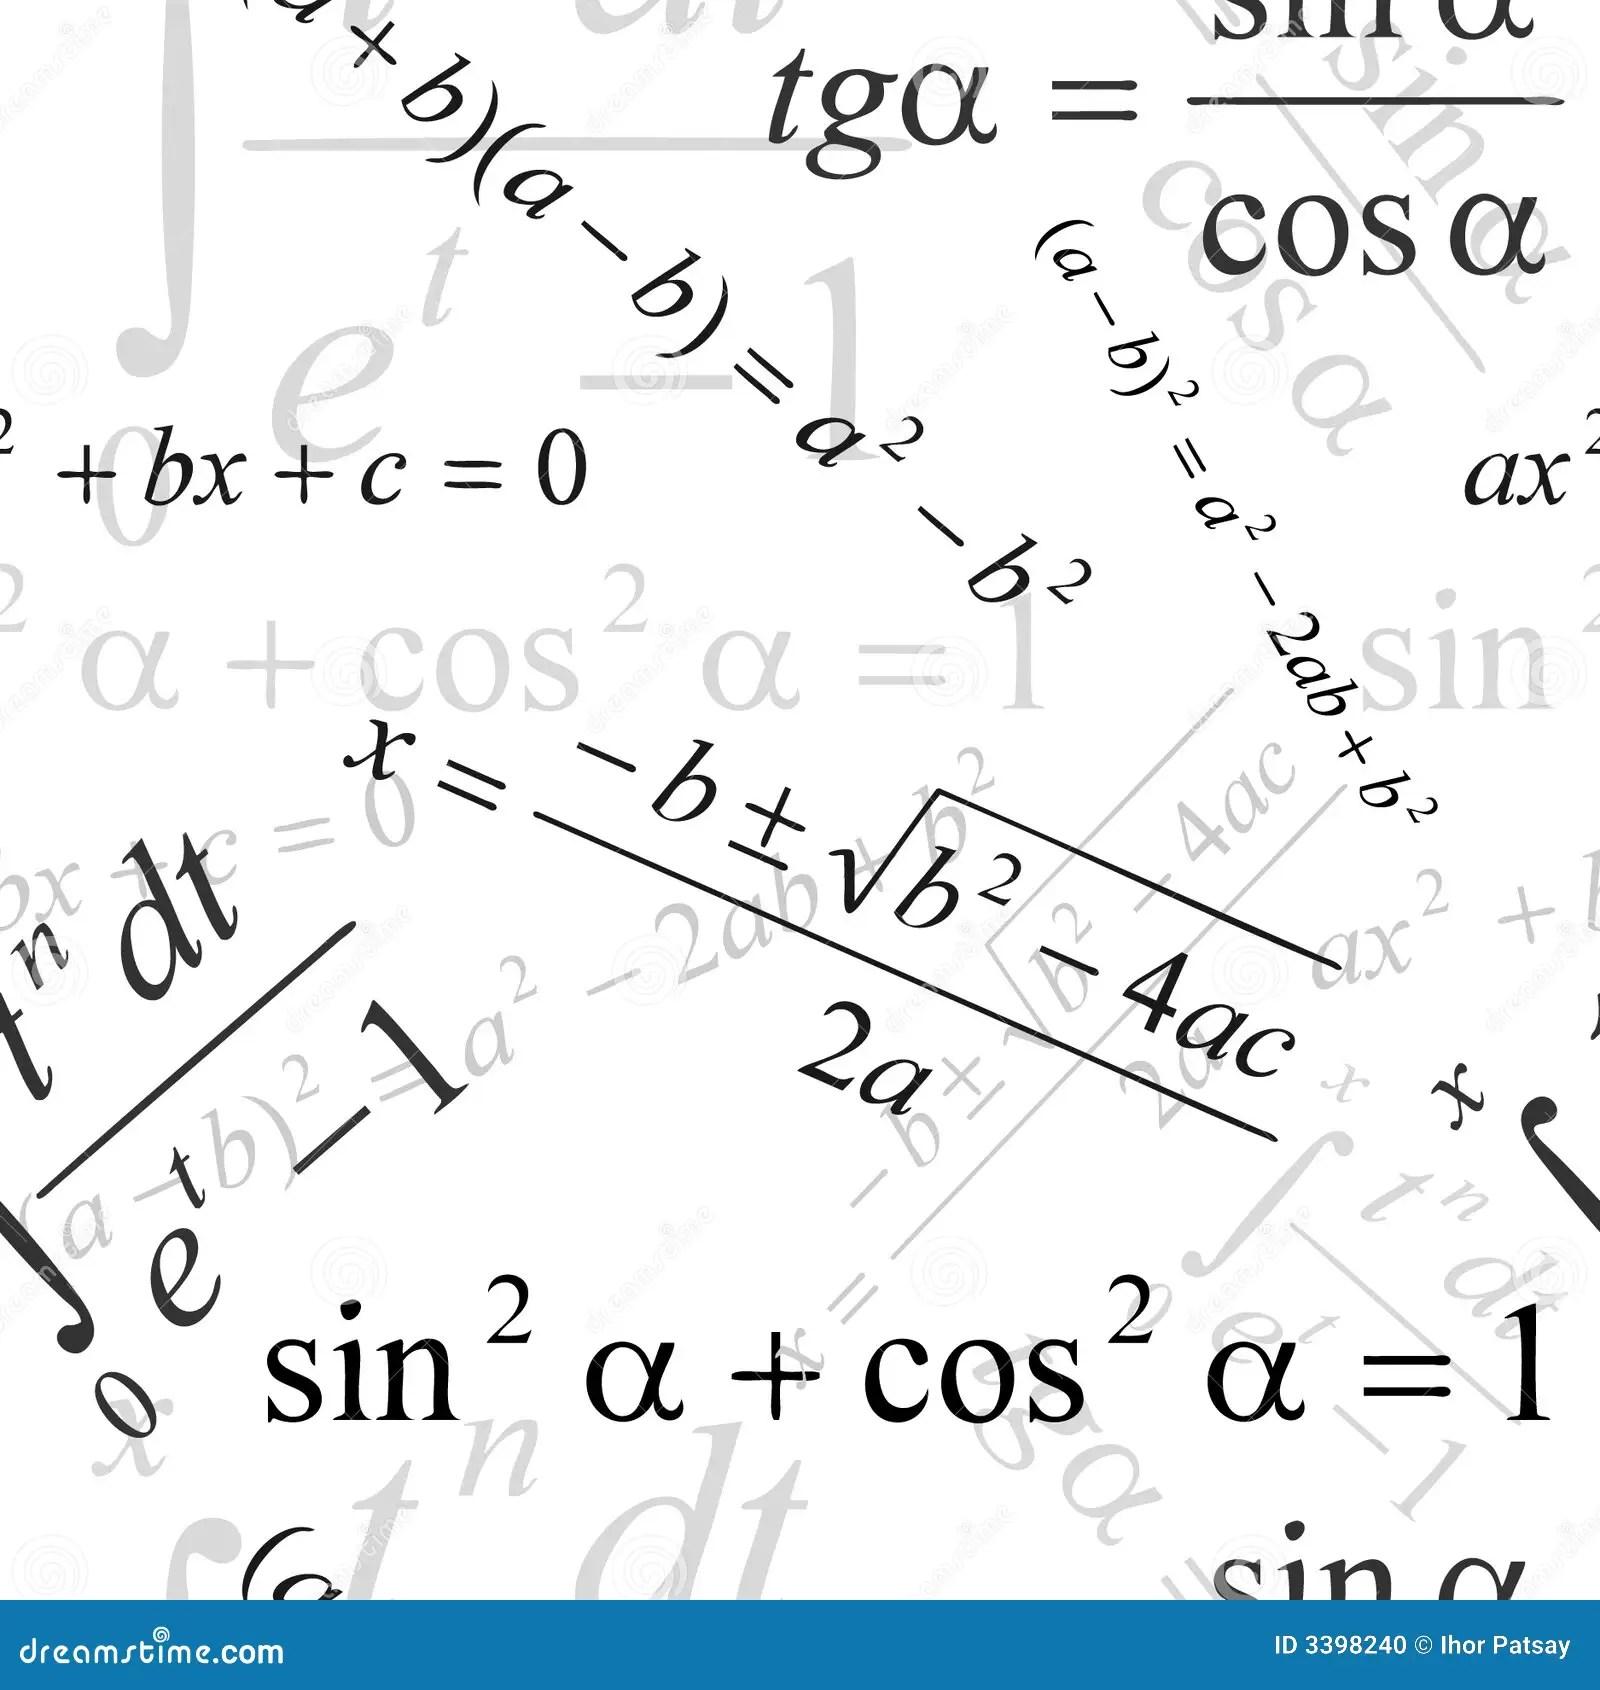 Mathematical wallpaper stock vector. Illustration of